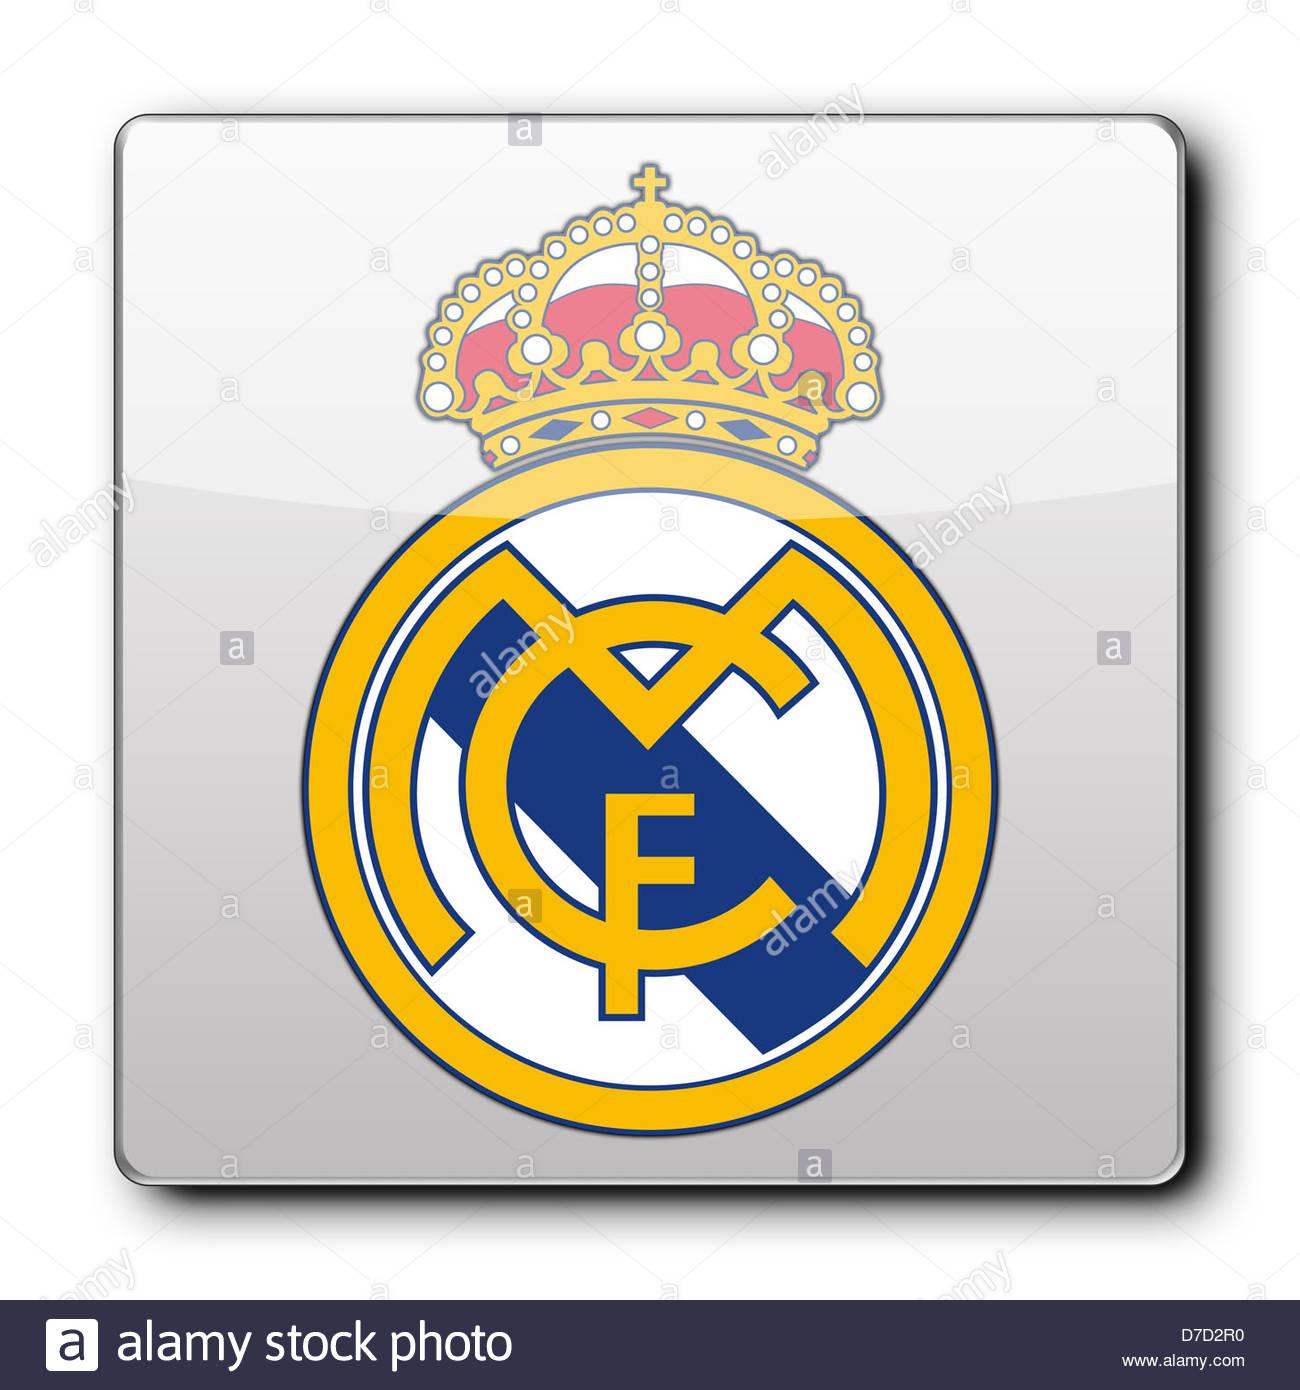 Real madrid logo icon app banner flag stock photo 56221284 alamy real madrid logo icon app banner flag voltagebd Choice Image